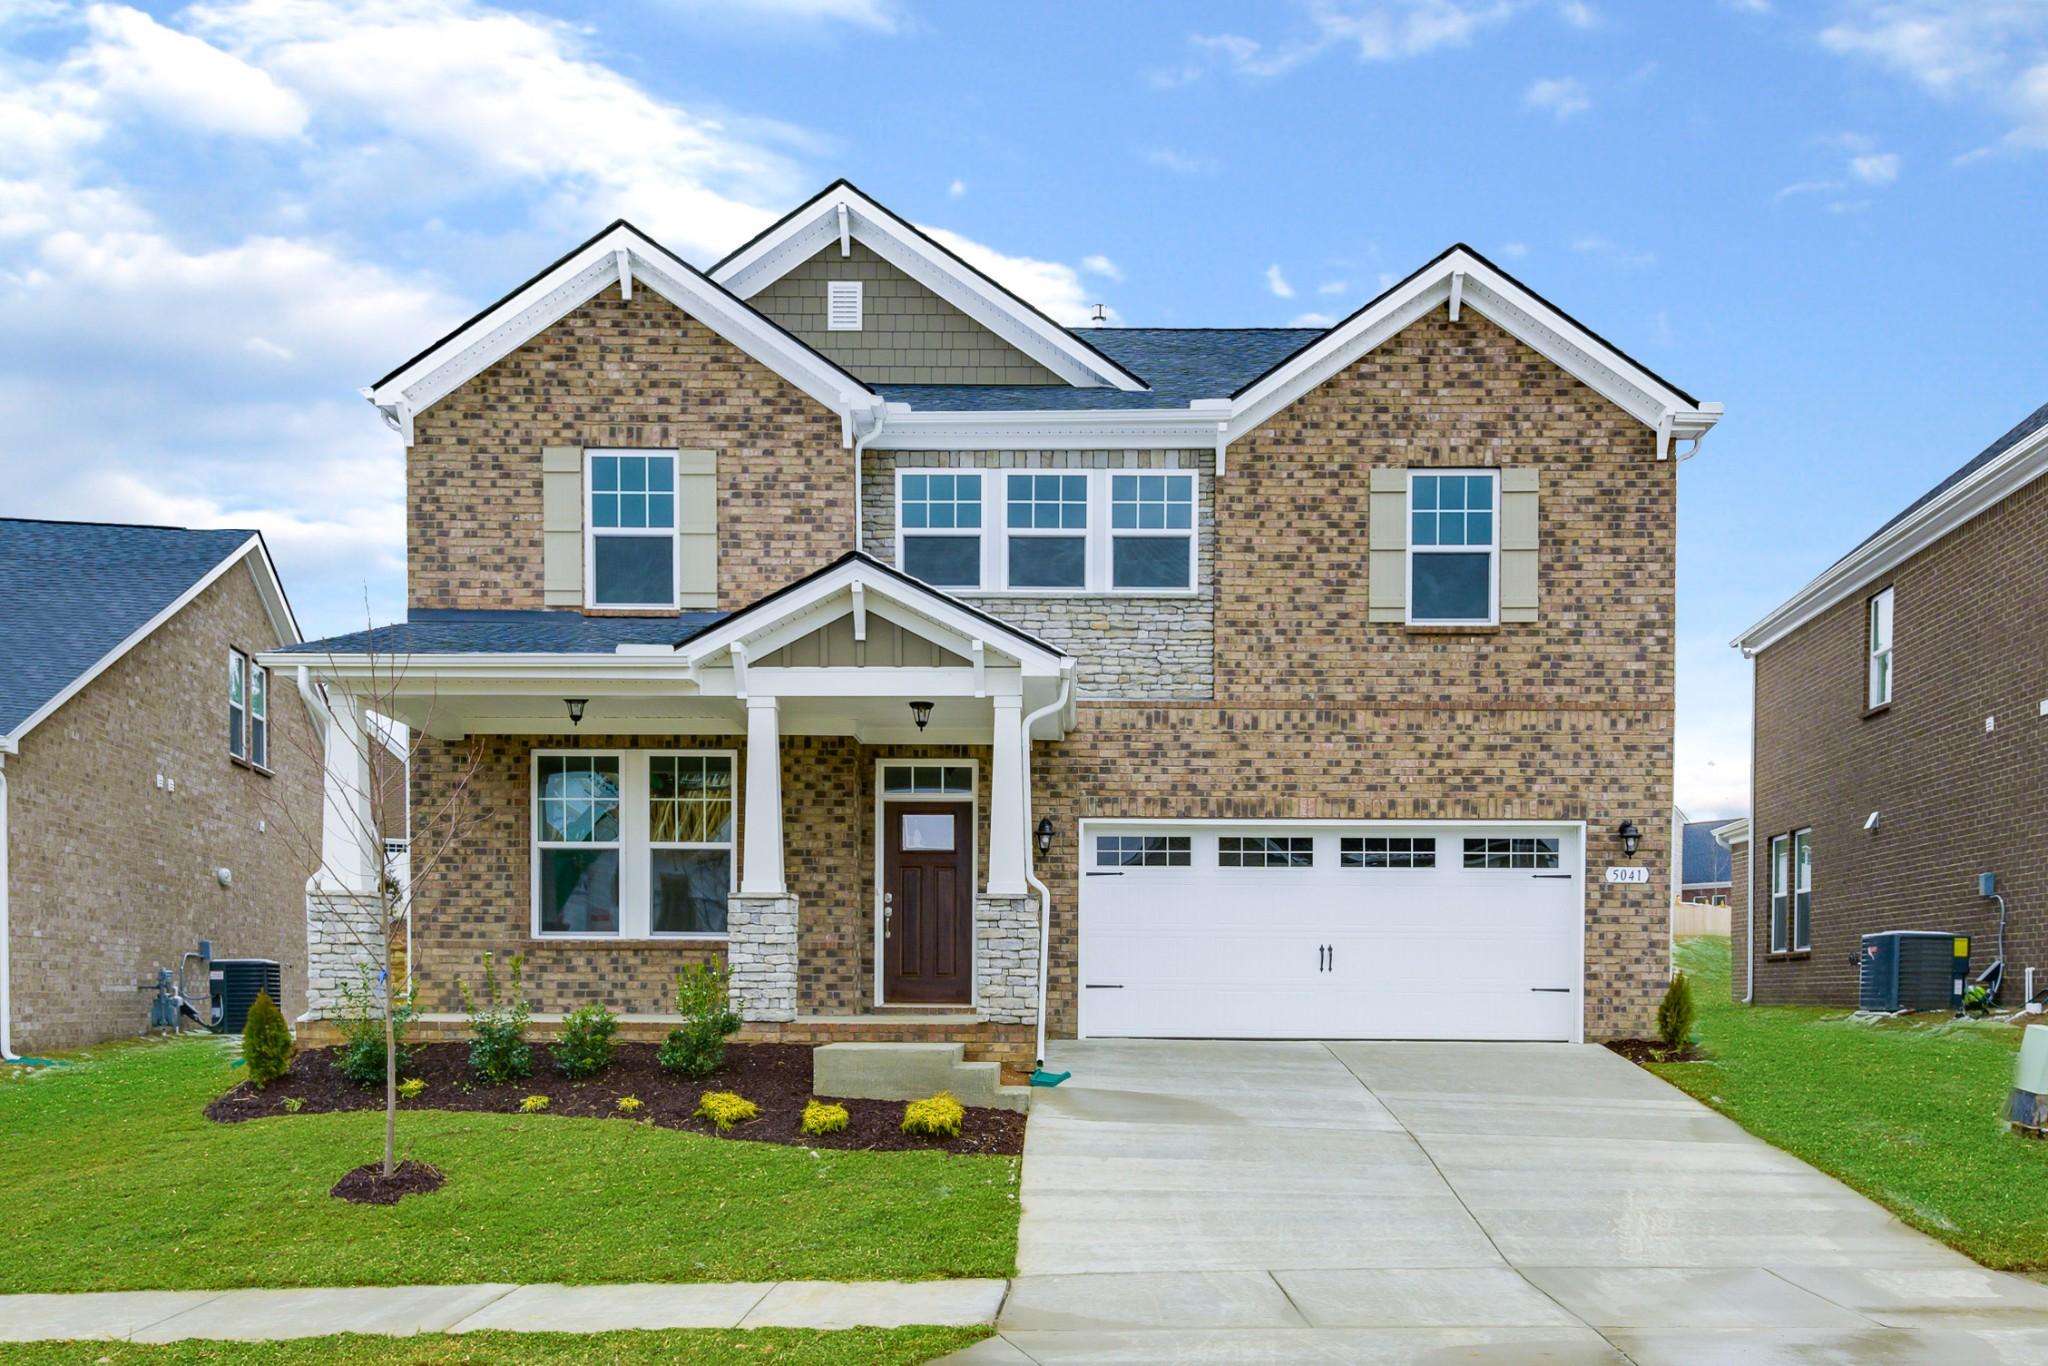 5041 Sunflower Ln, Hermitage, TN 37076 - Hermitage, TN real estate listing